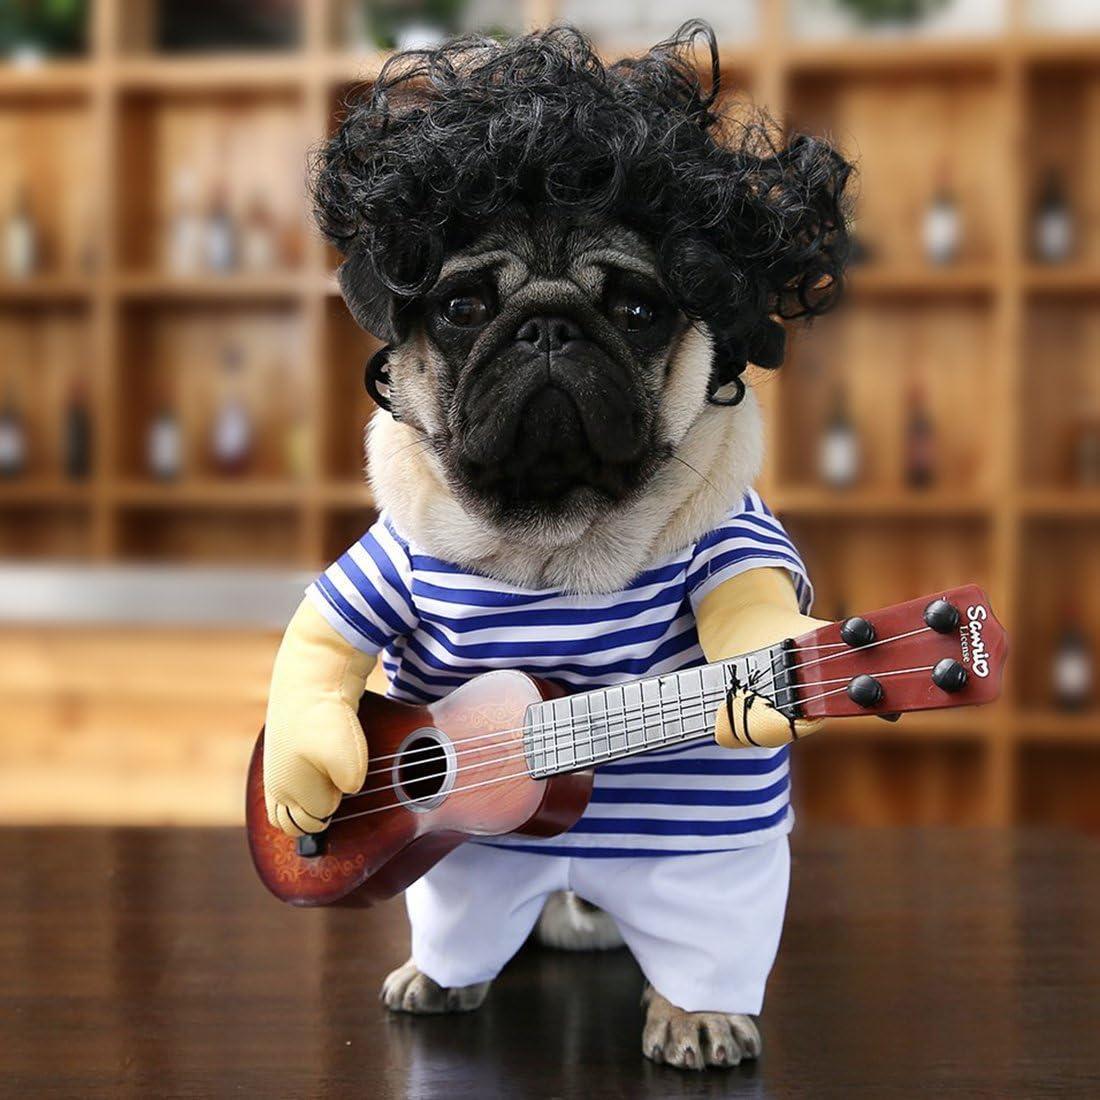 carlino costume cane divertente social